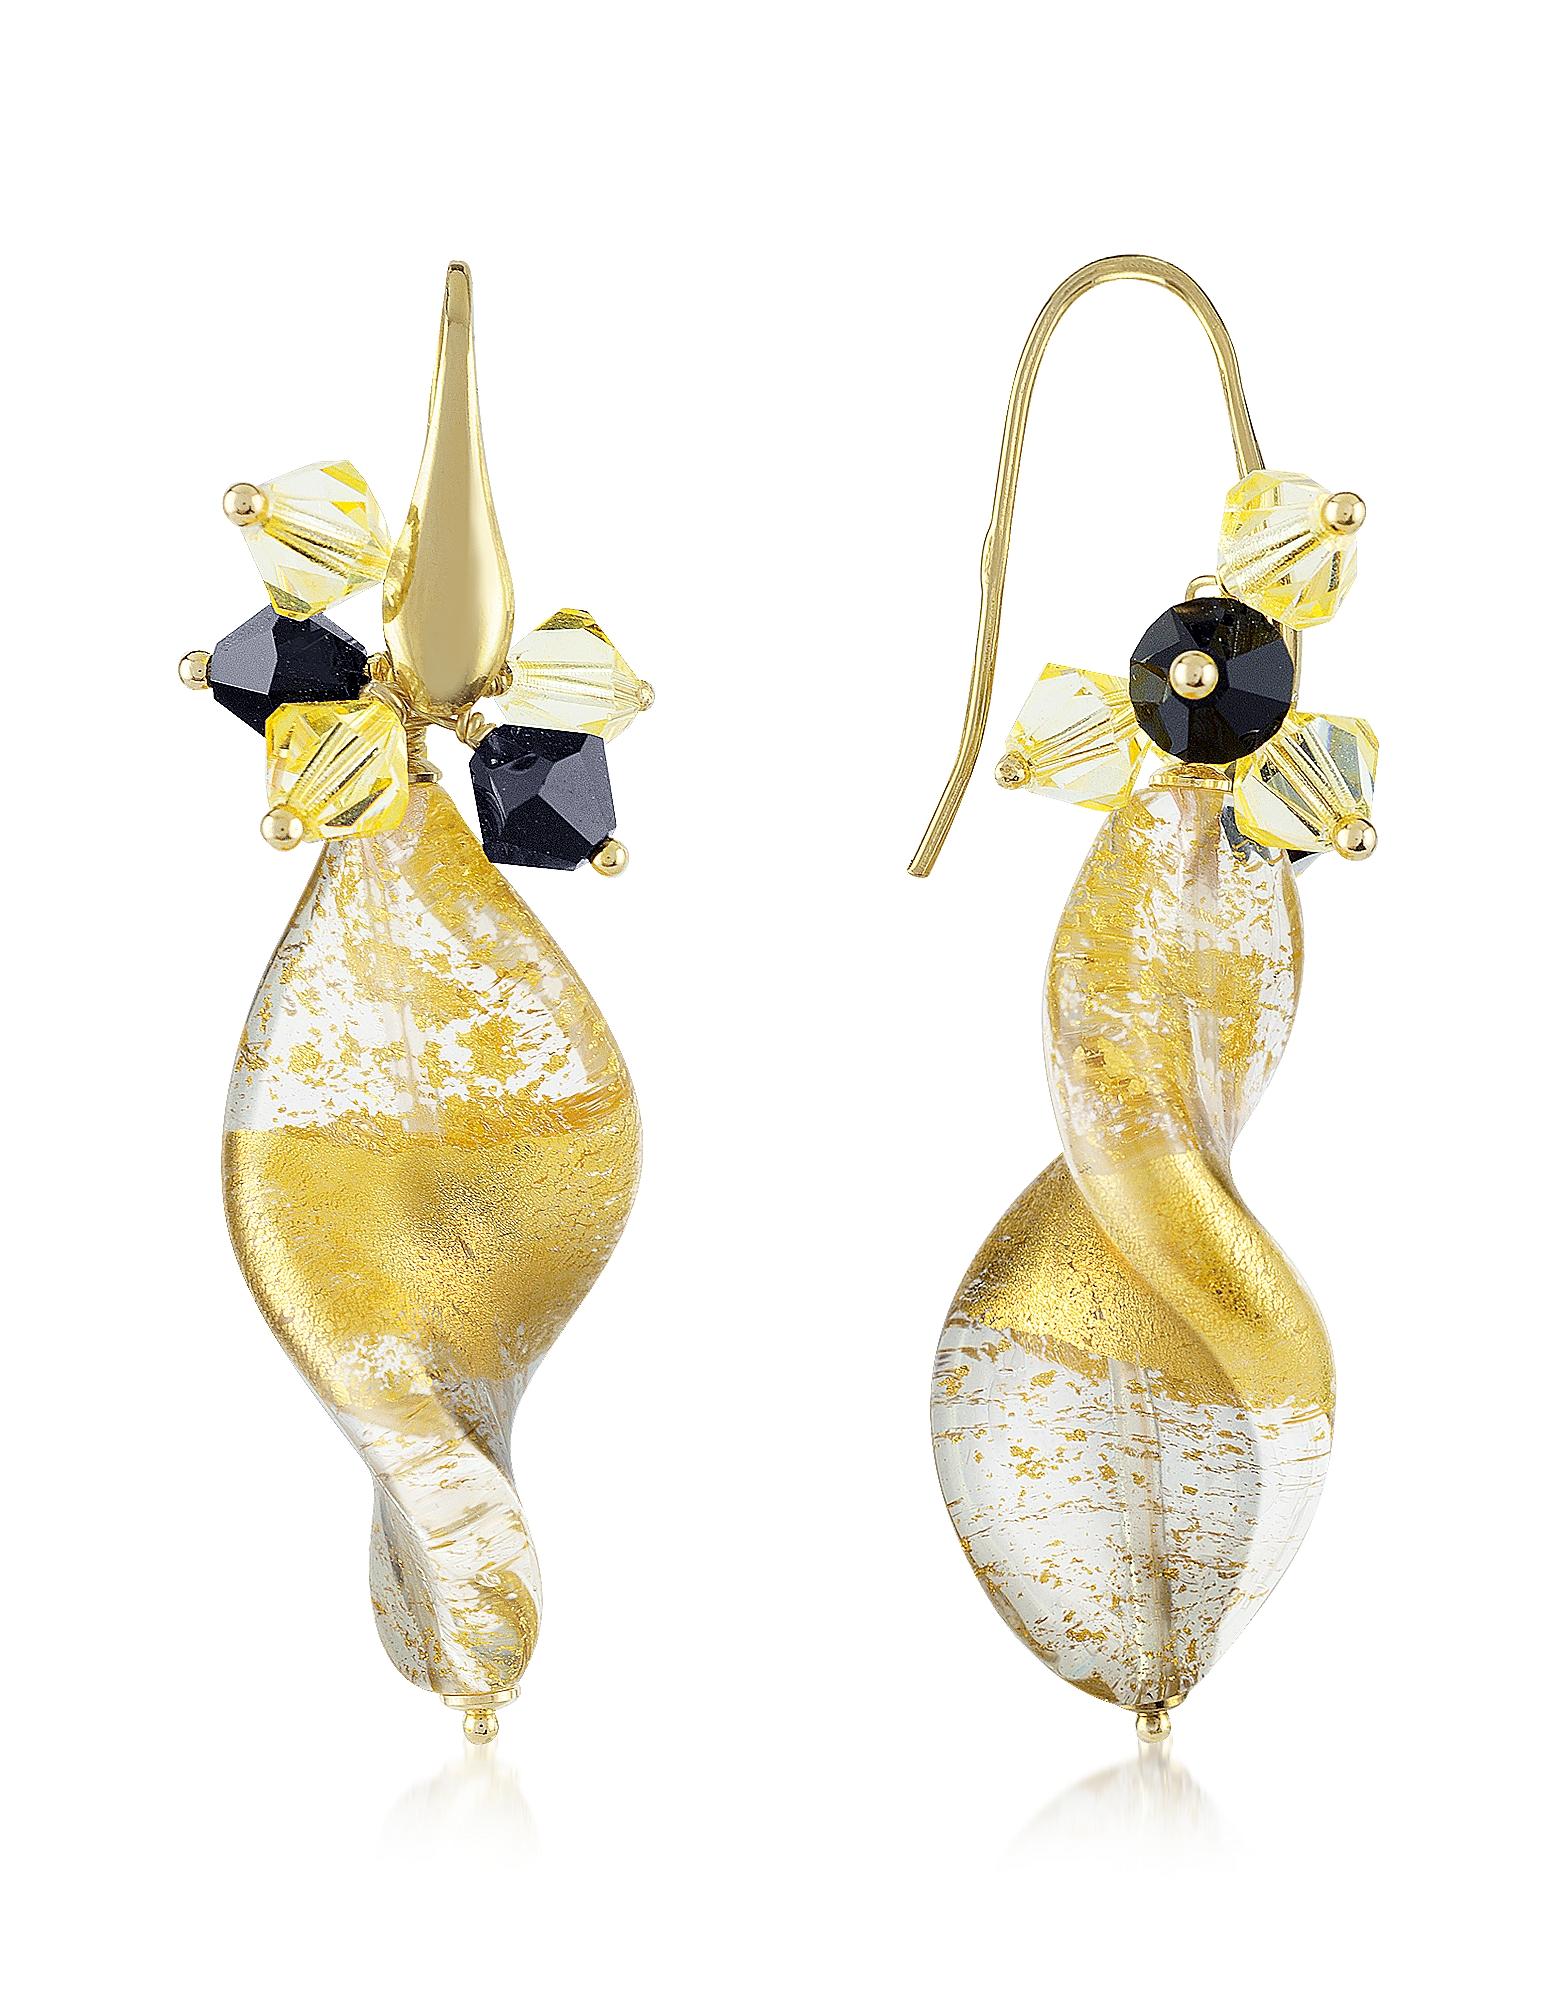 Briciole D'Oro - Серьги с Золотым Листом и Кристаллами